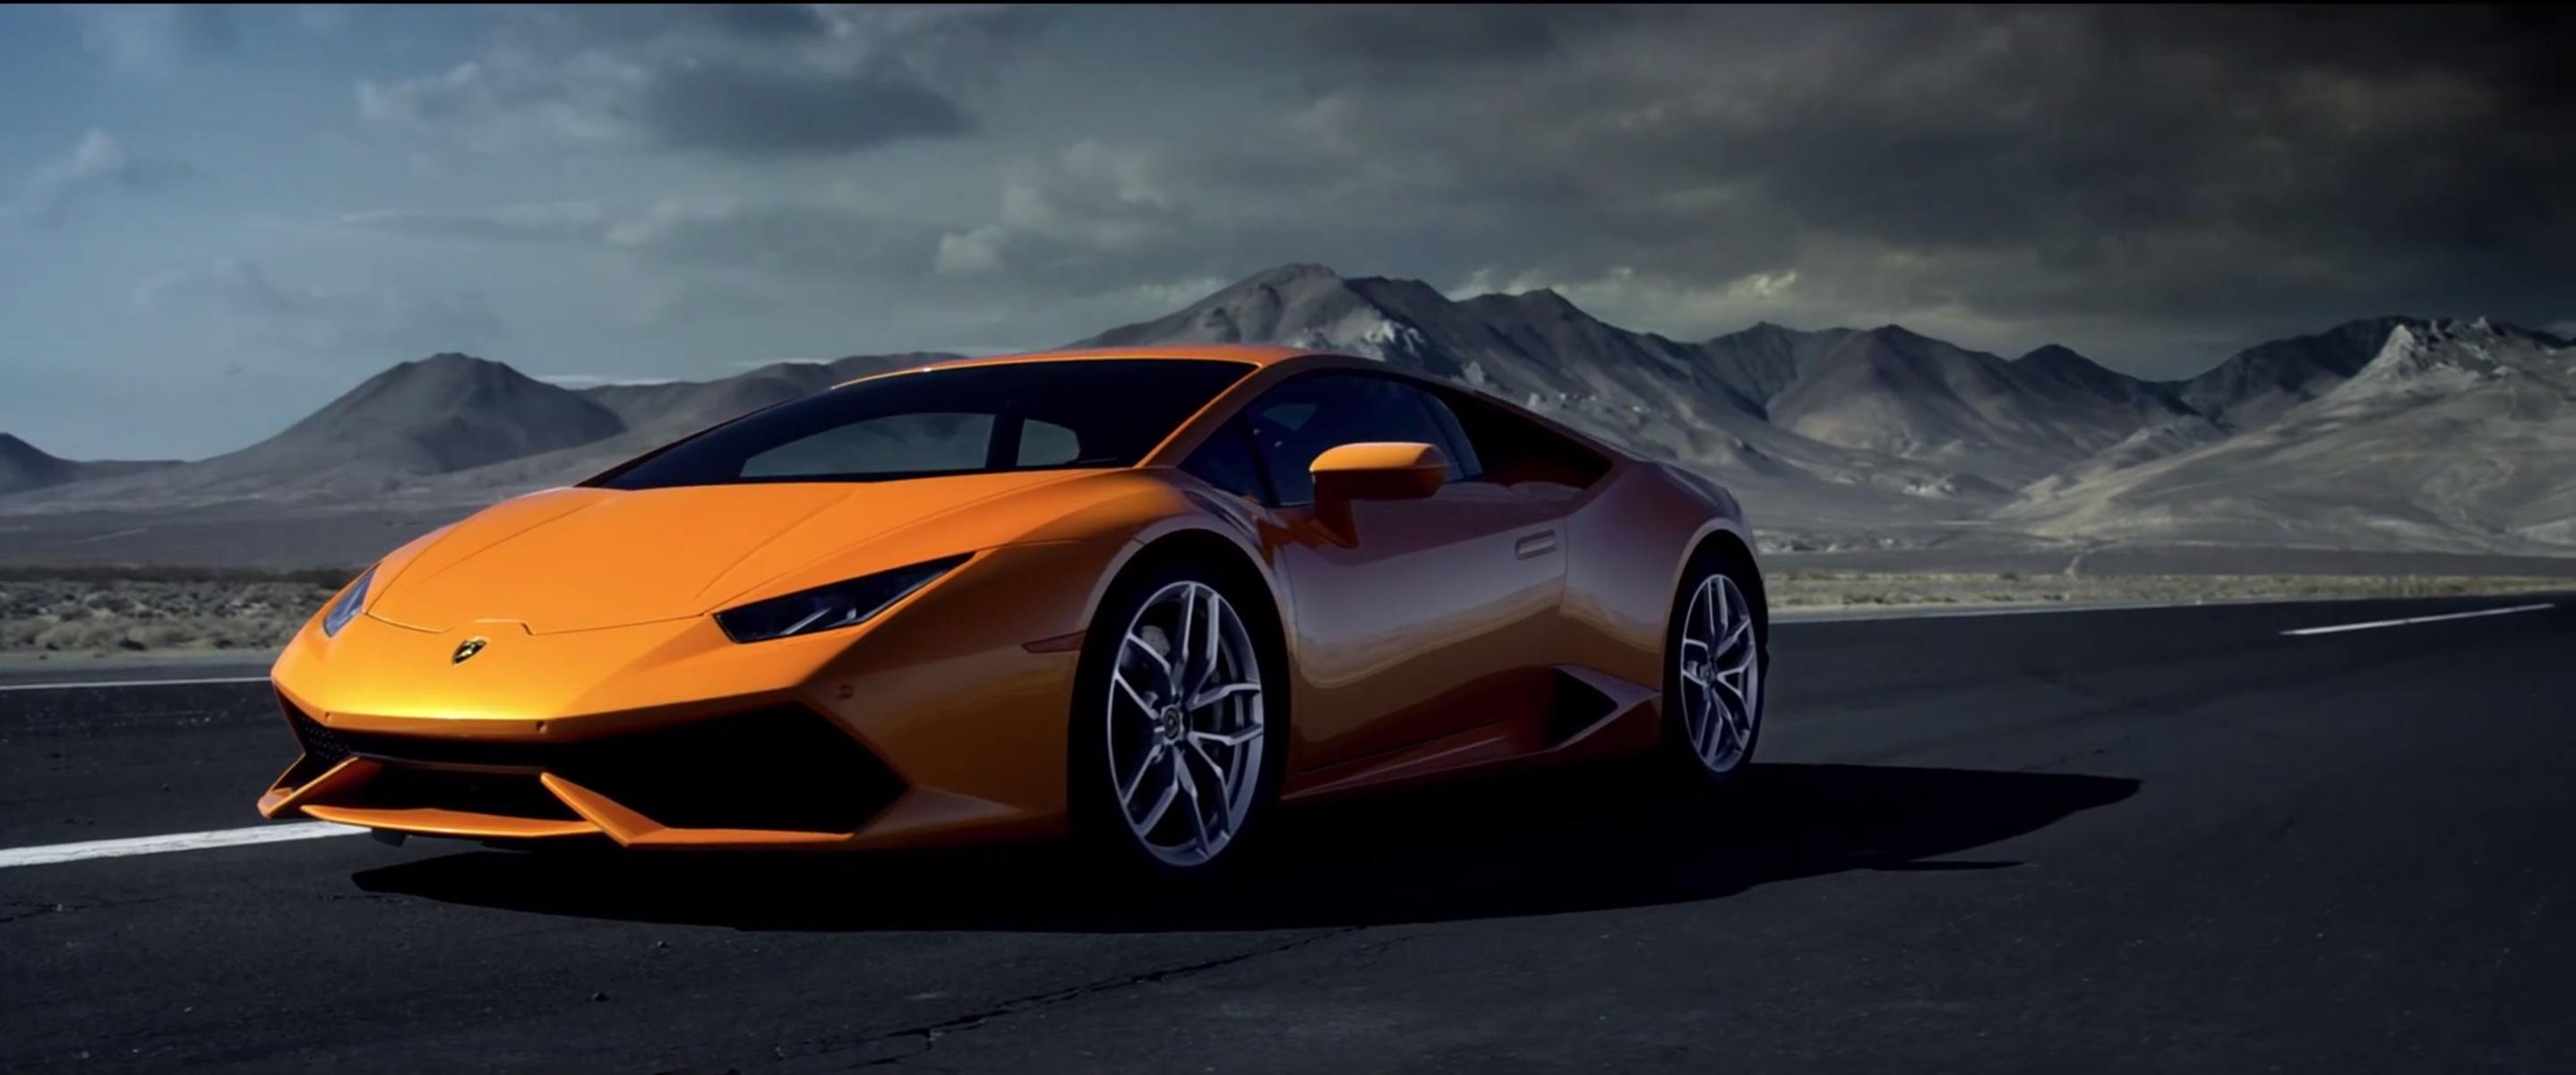 Pack De 55 Wallpapers De Carros Hd: Lamborghini Huracan HD Wallpaper